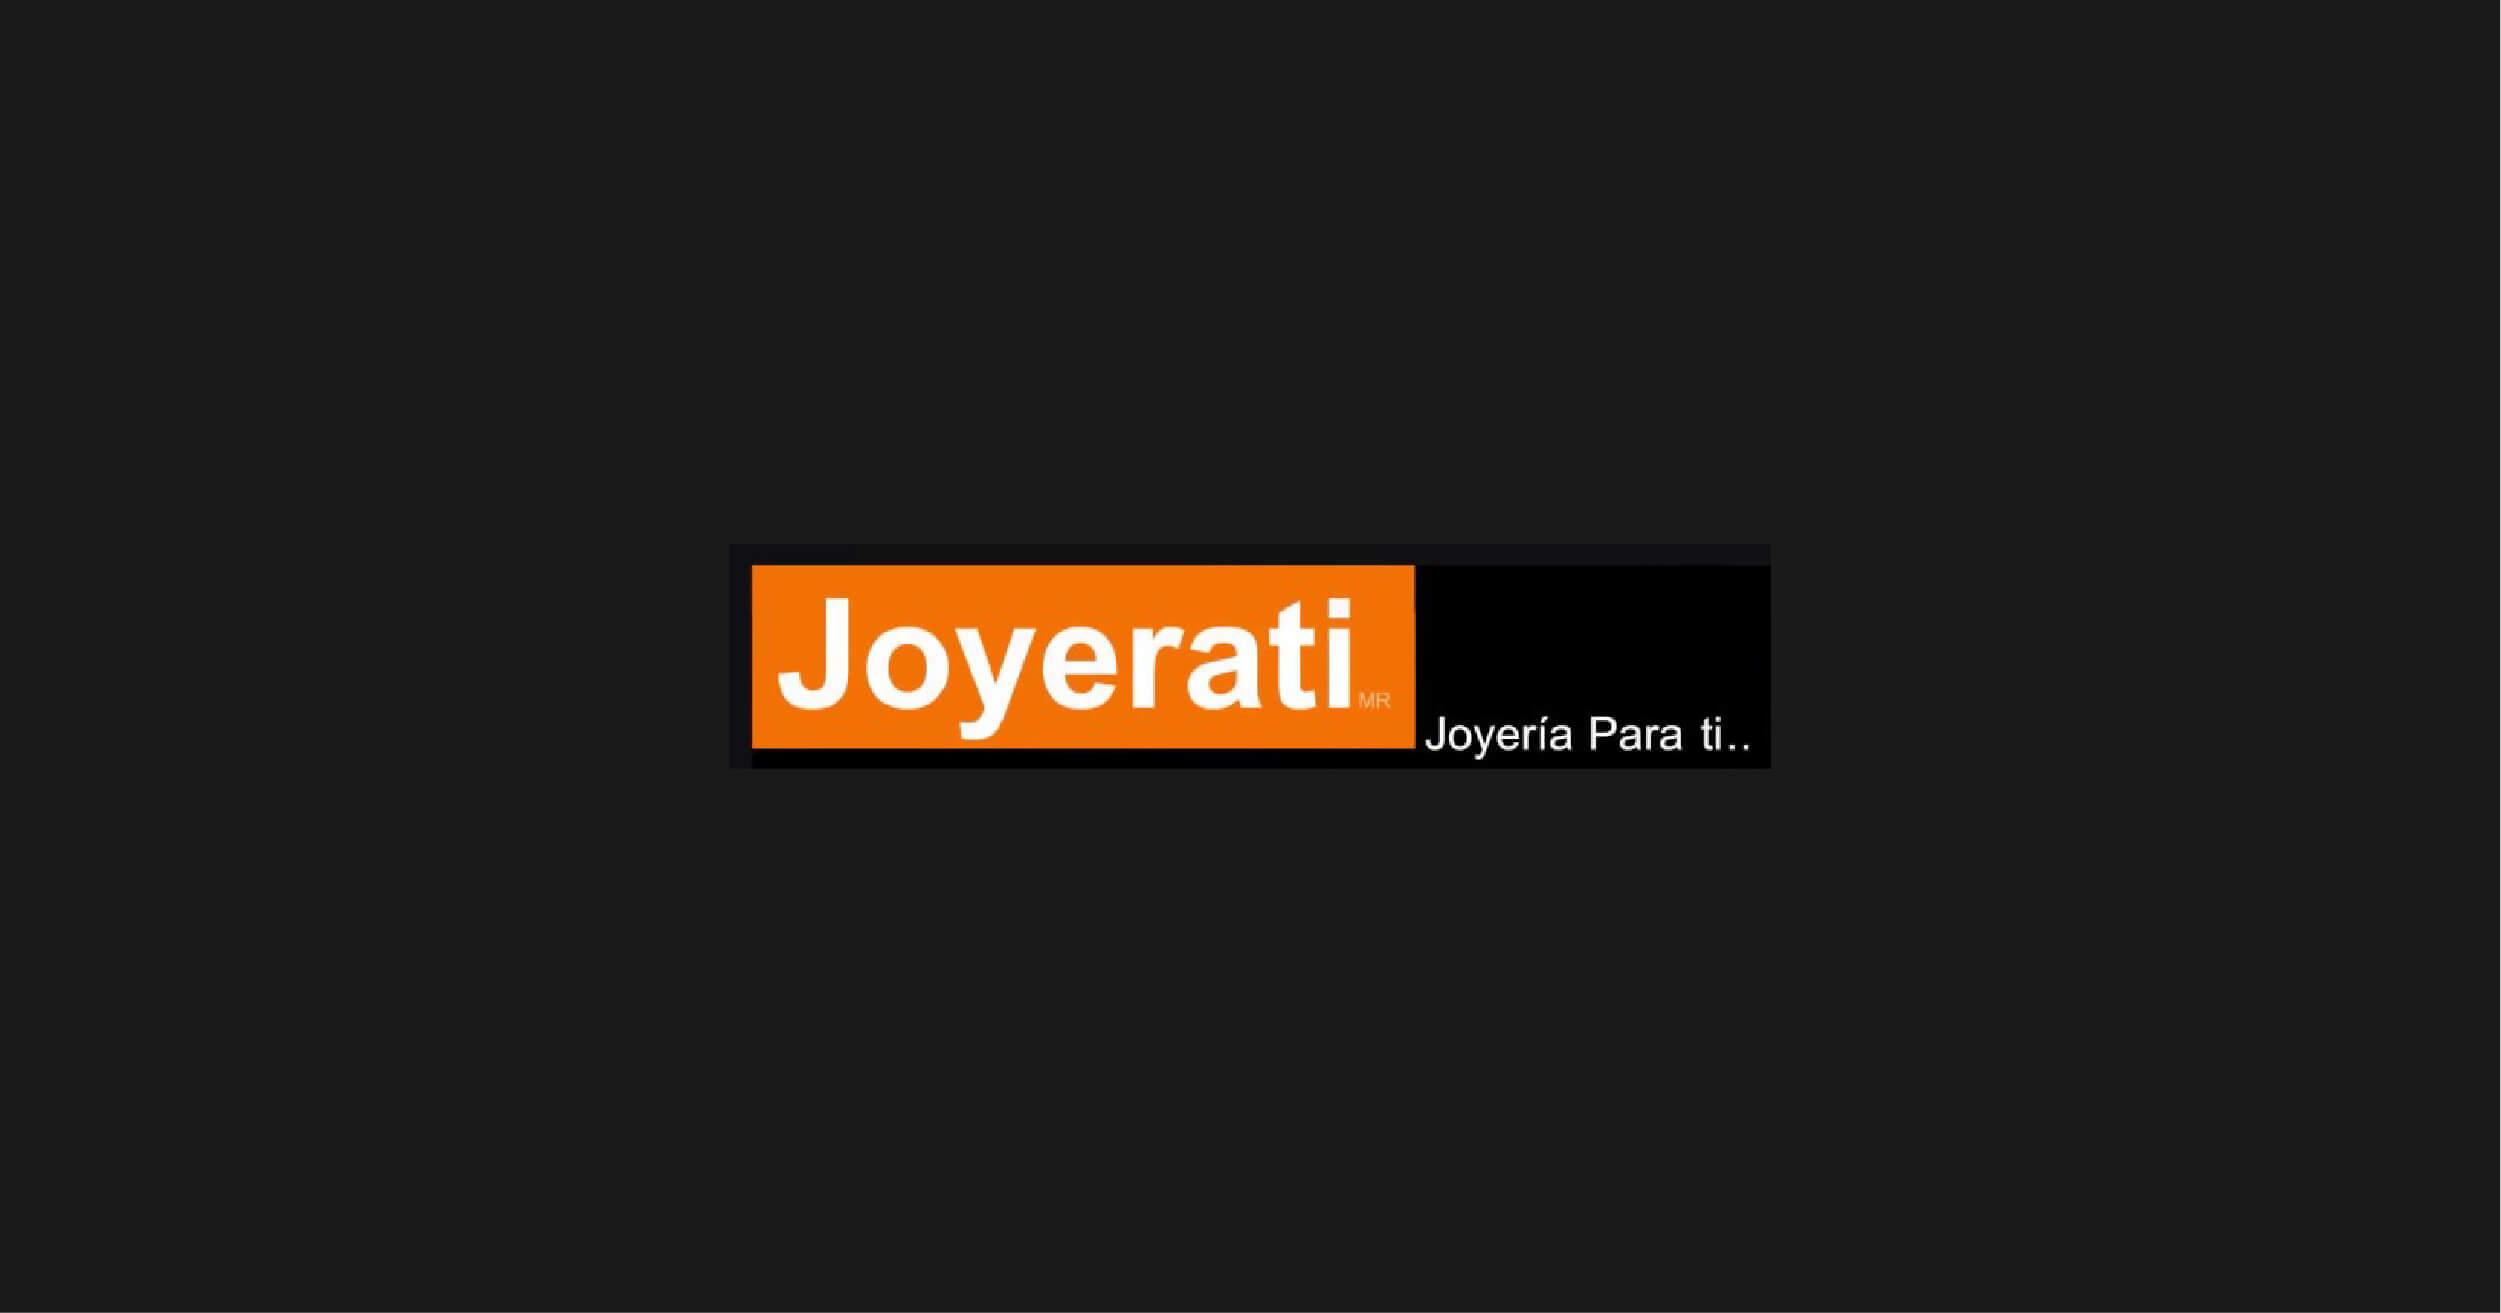 FullFrame-Photomkt-Portafolio-Cover-Joyerati